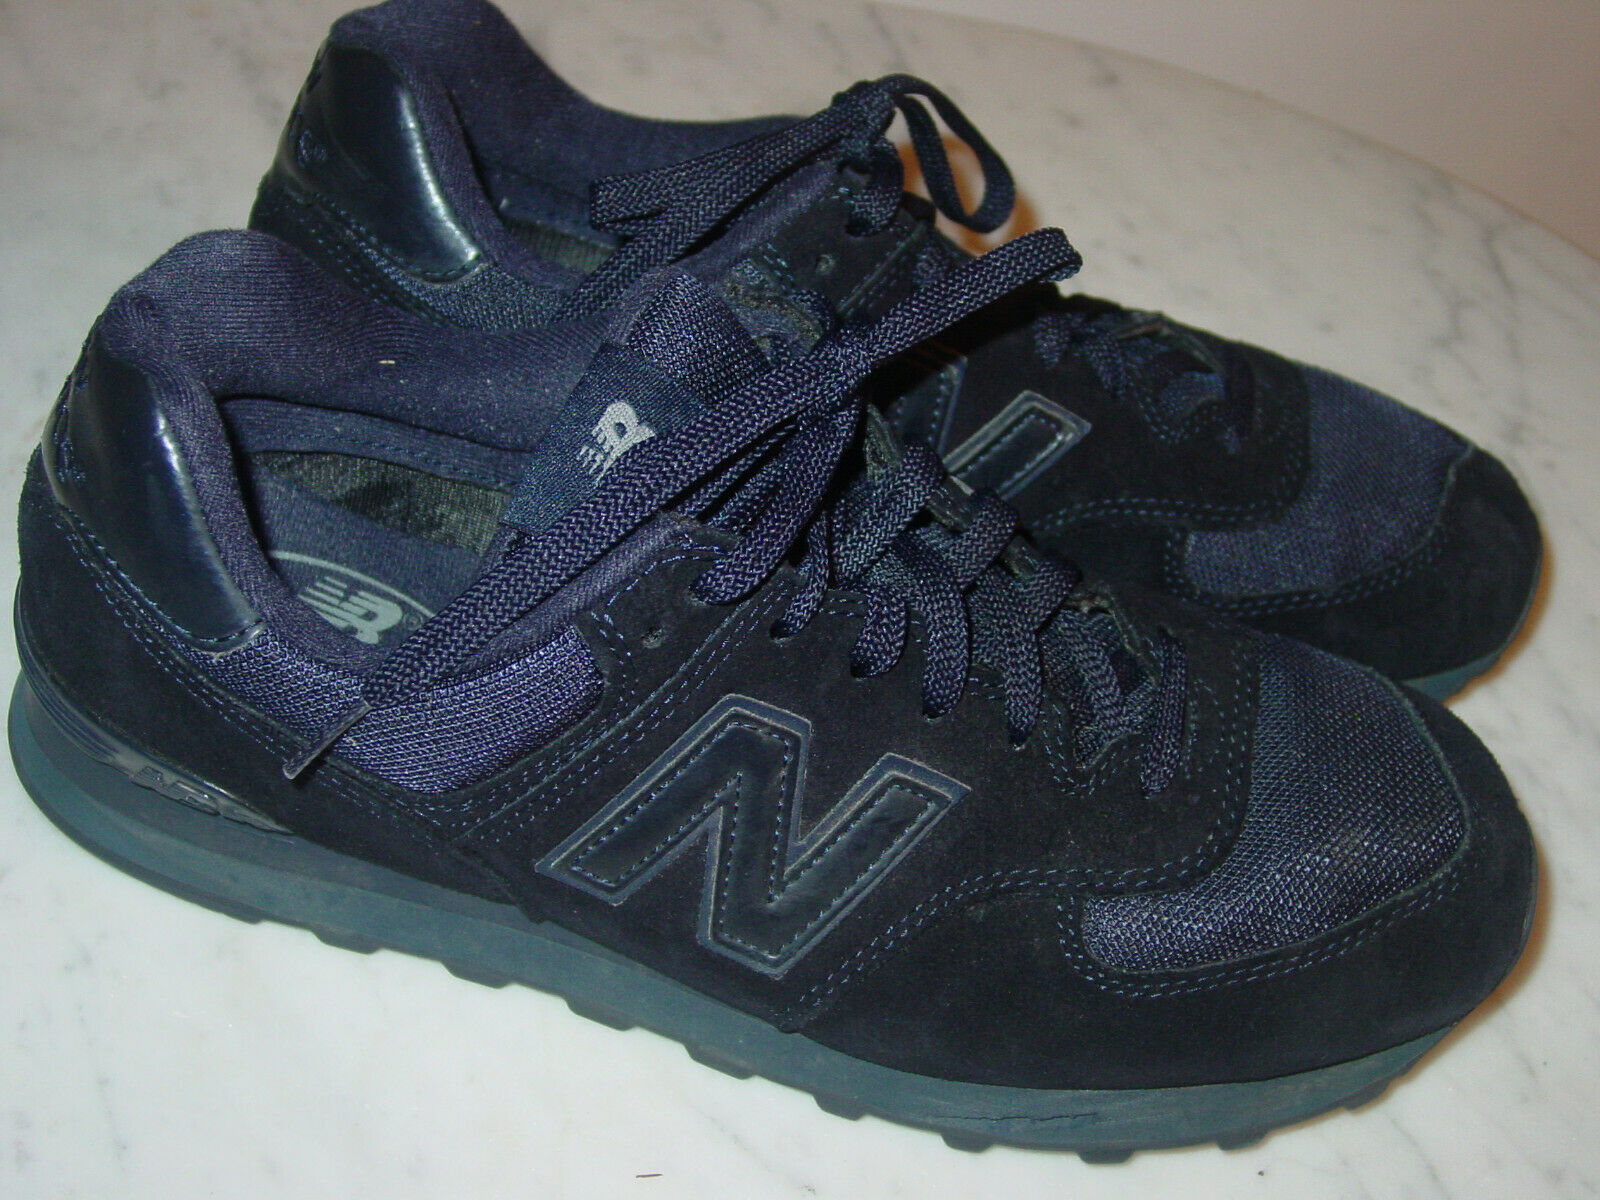 Para Hombre 574  New Balance 574 TNV  Gamuza Azul Marino M Azul Running Zapatos